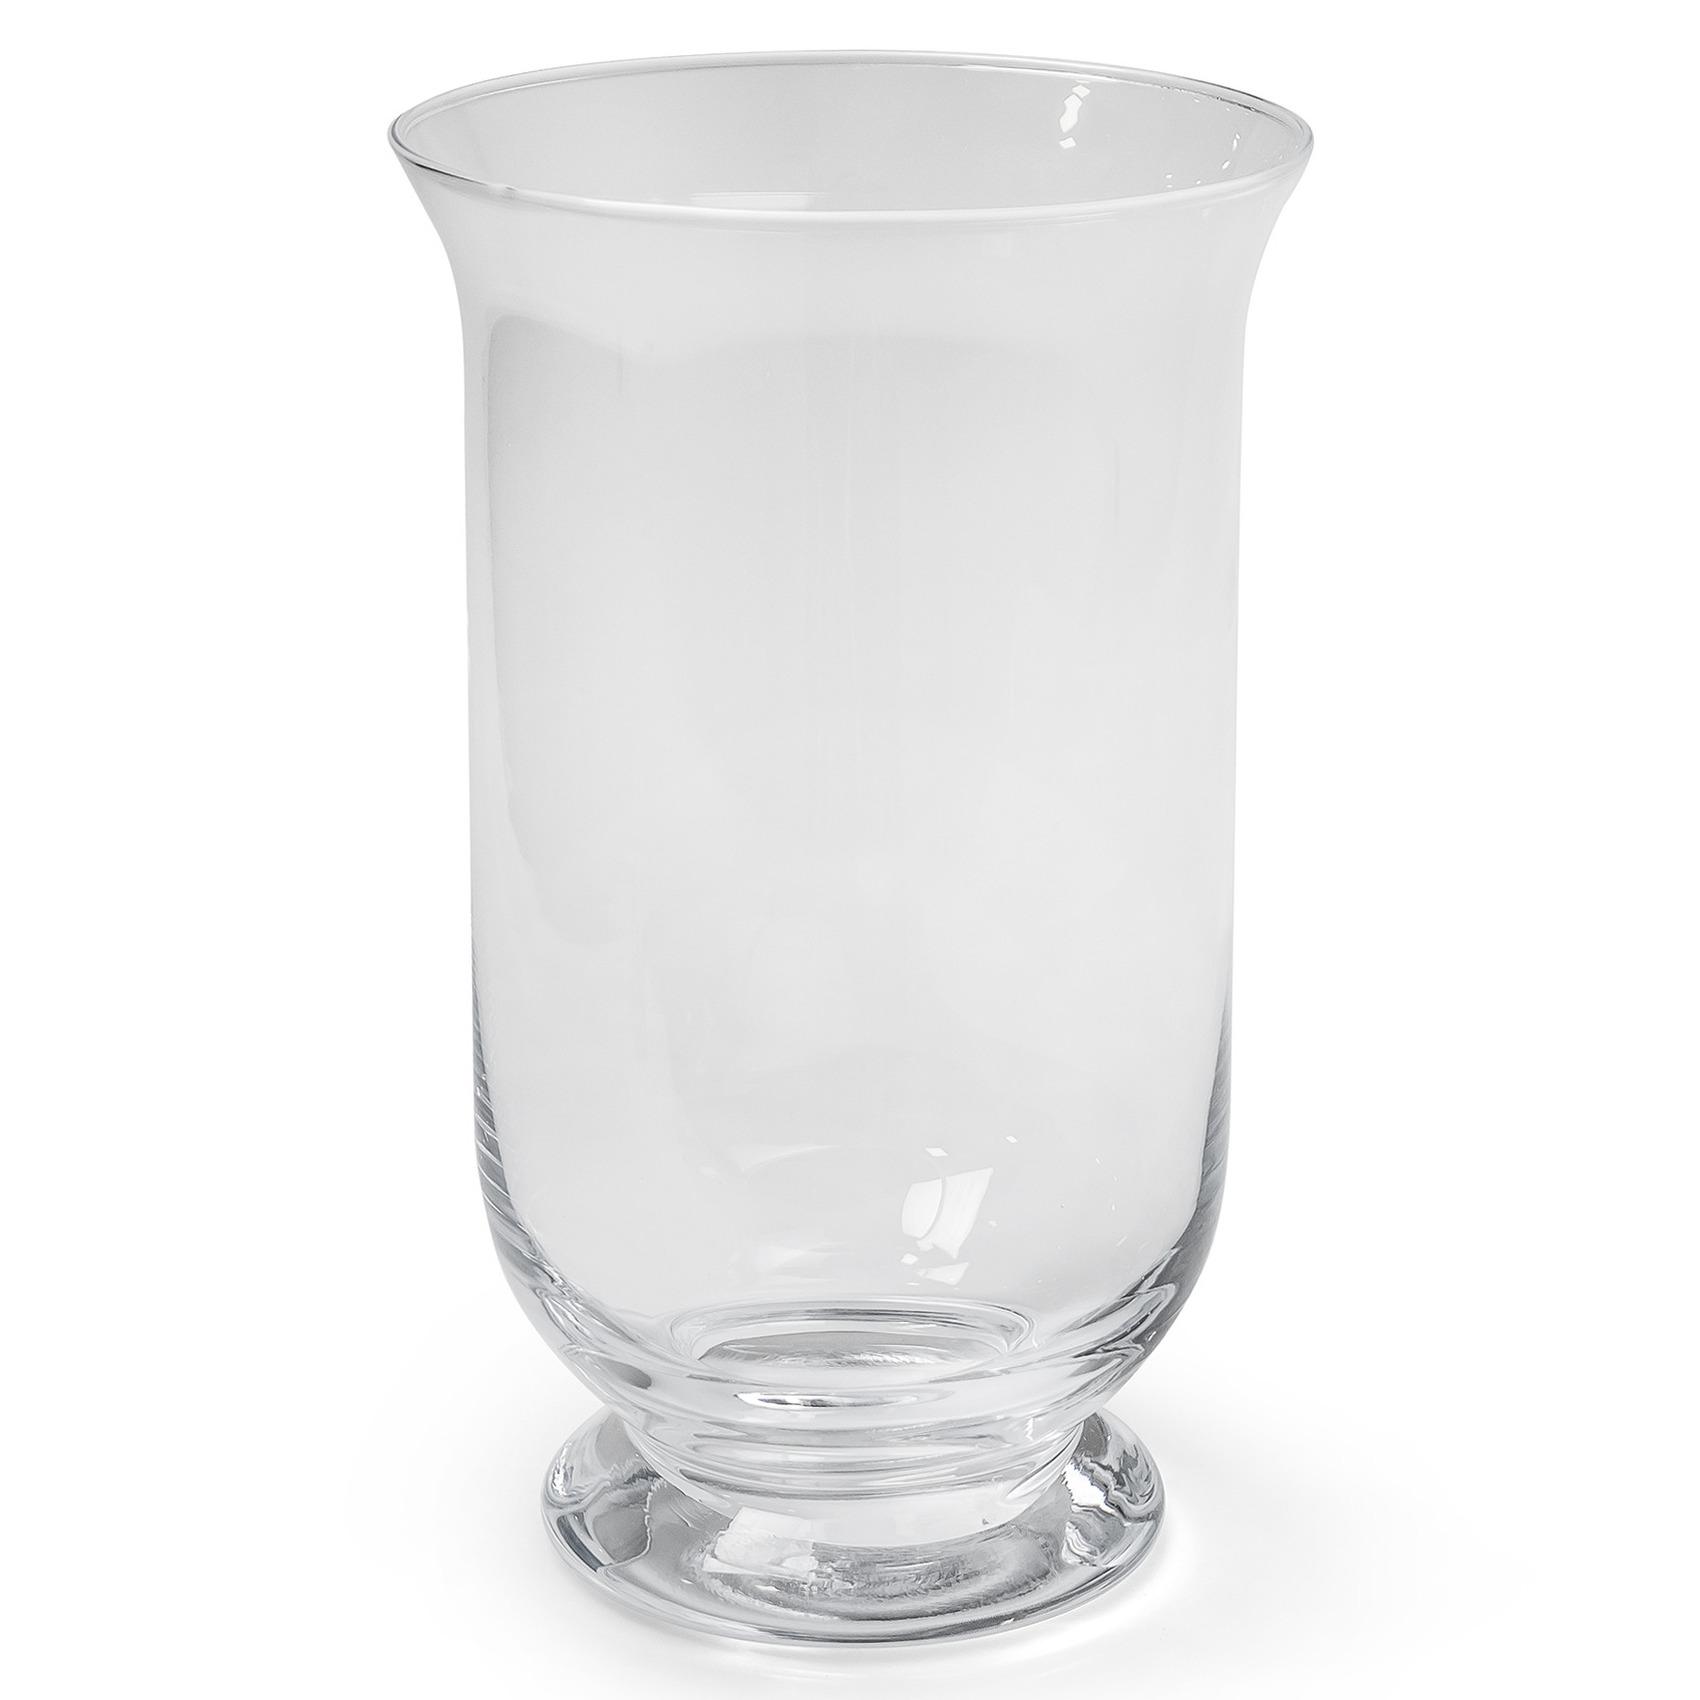 Transparante windlicht vaas-vazen van glas 15 x 25 cm